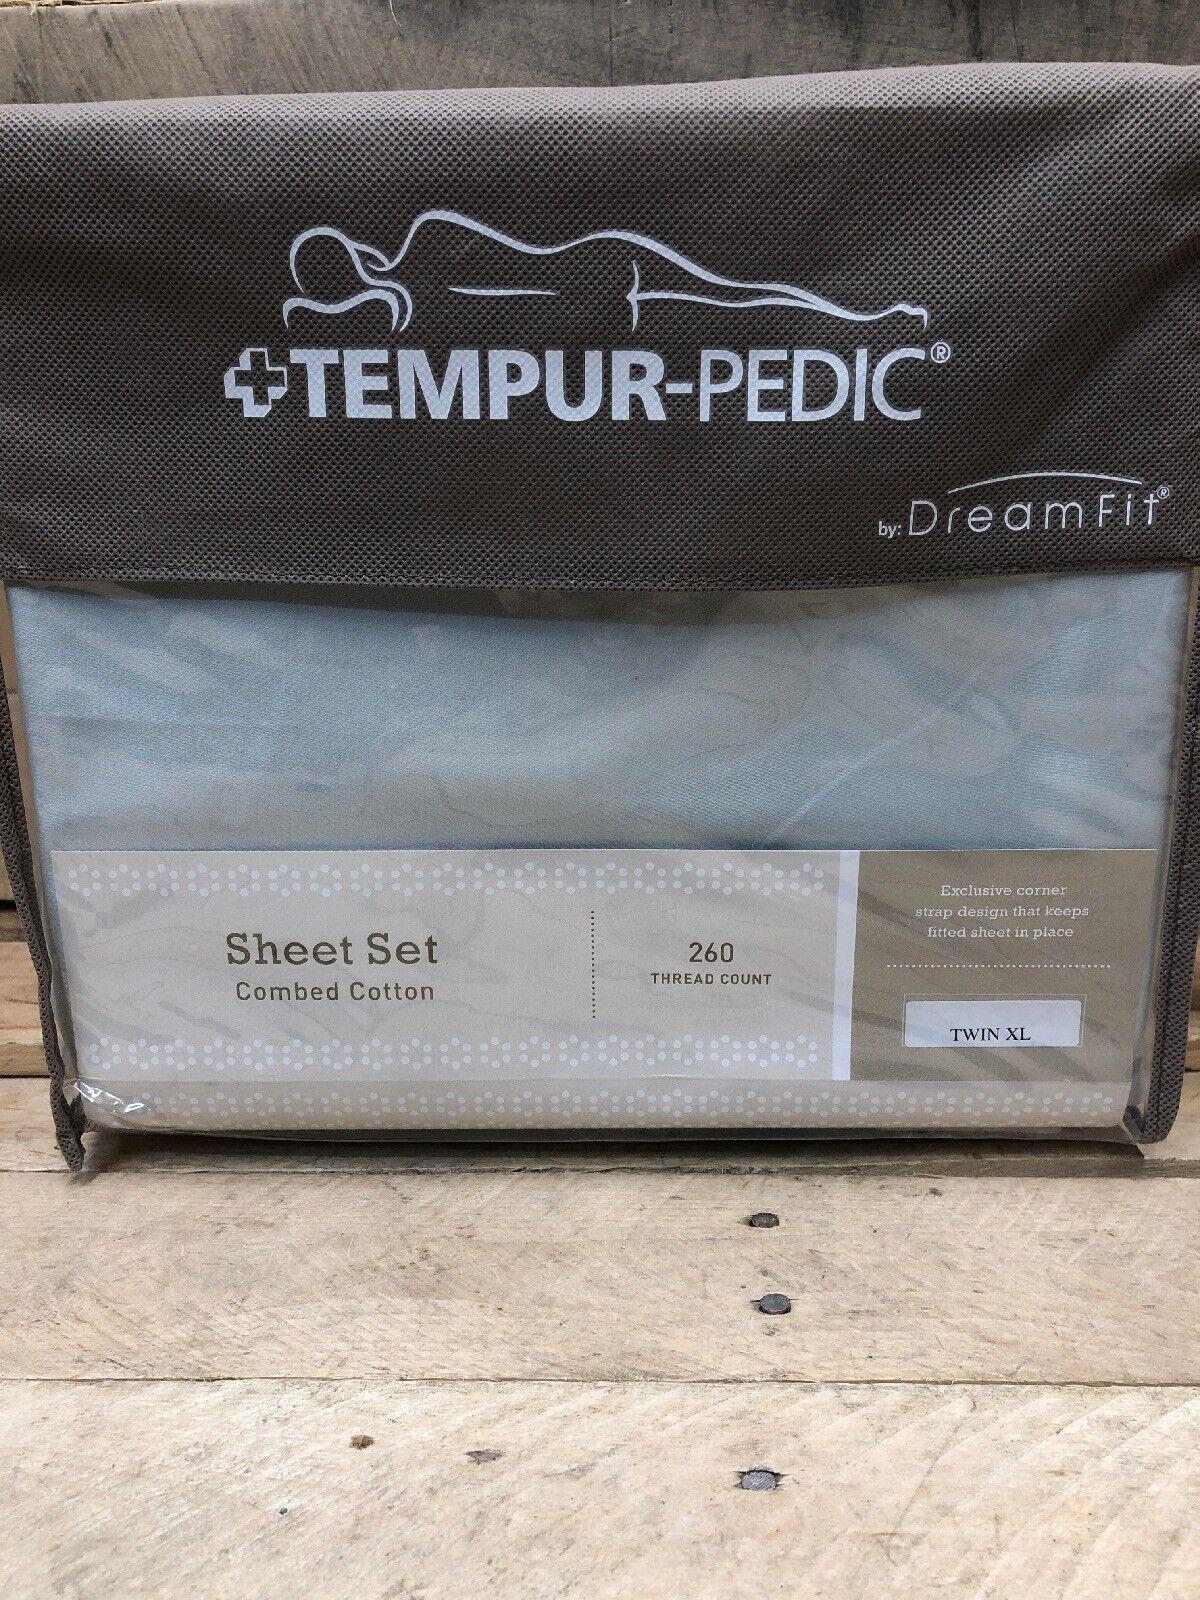 Tempur-Pedic Dream Pale Grün Twin XL 260Tc Combed Cotton Sheets (ped 68)